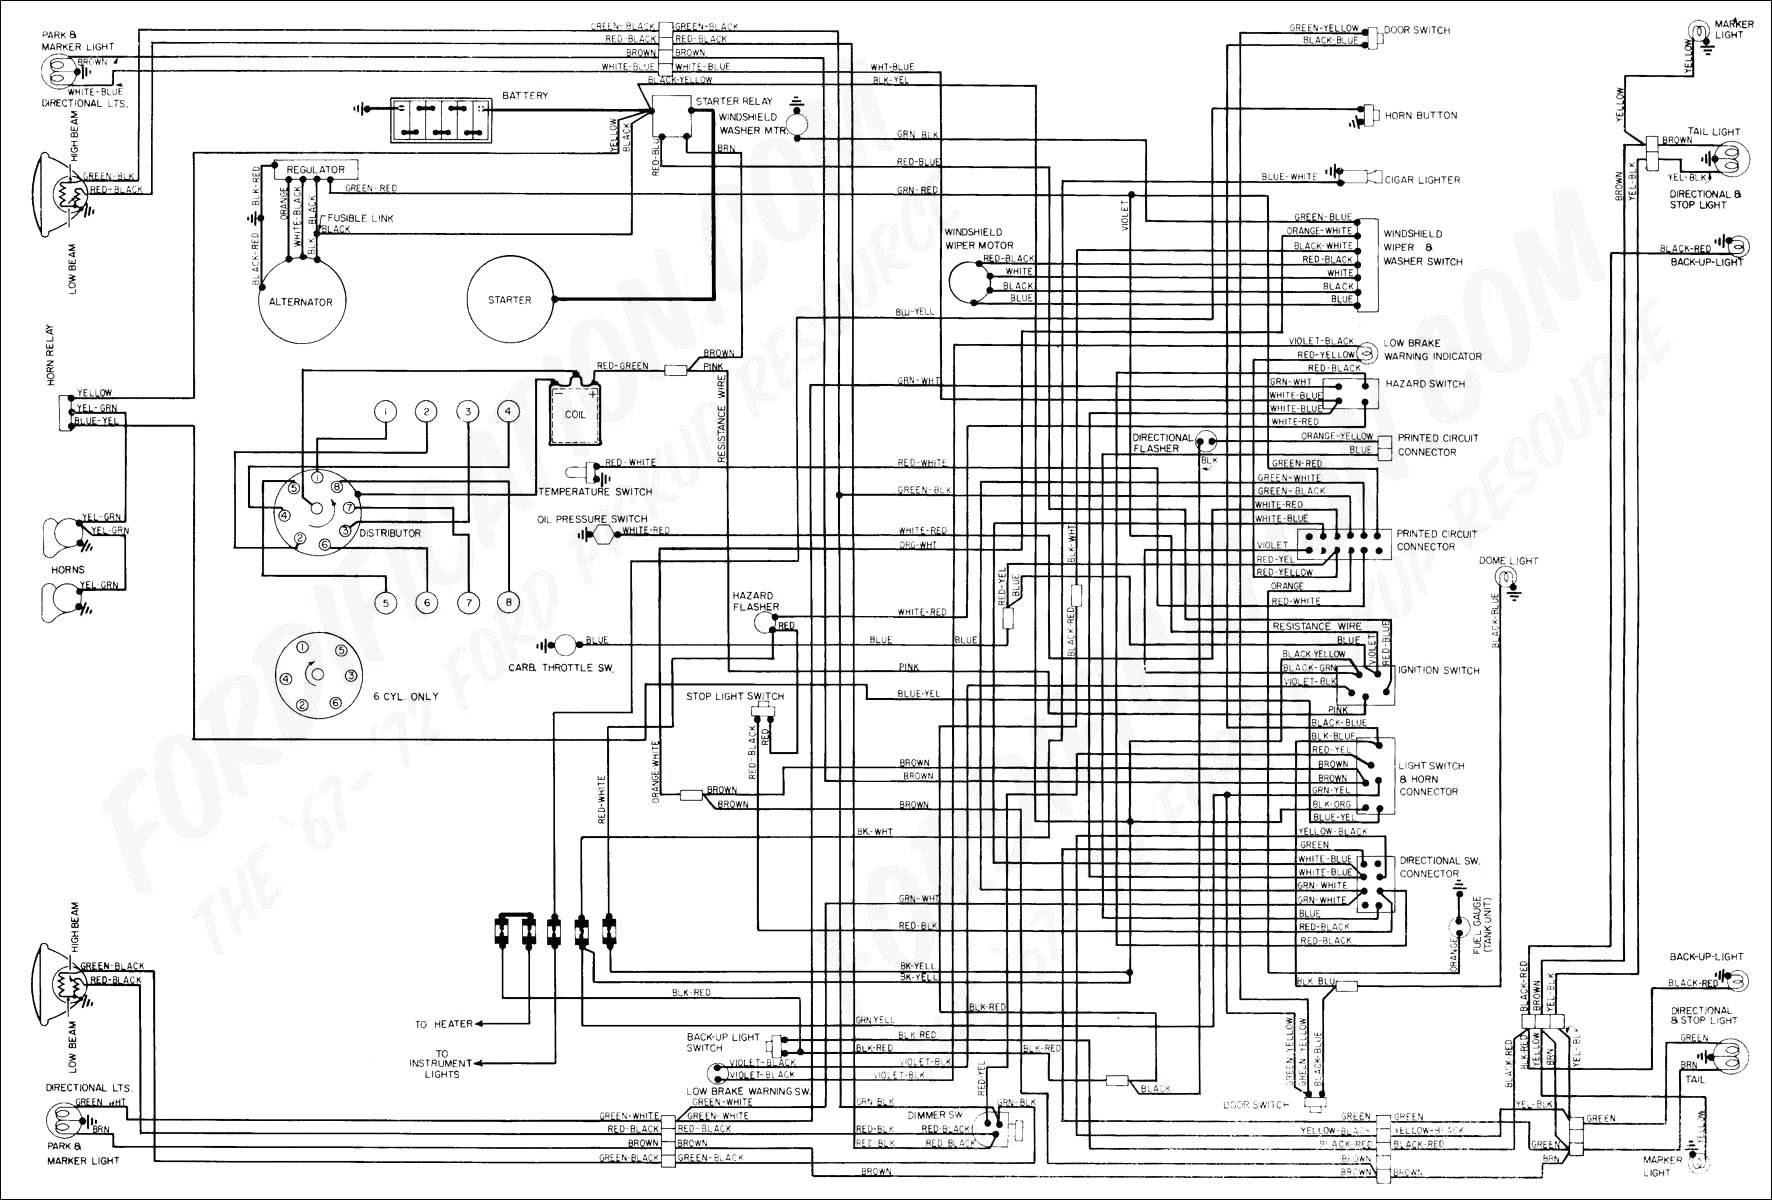 [DIAGRAM] 1961 1963 Ford F 100 Wiring Diagram FULL Version